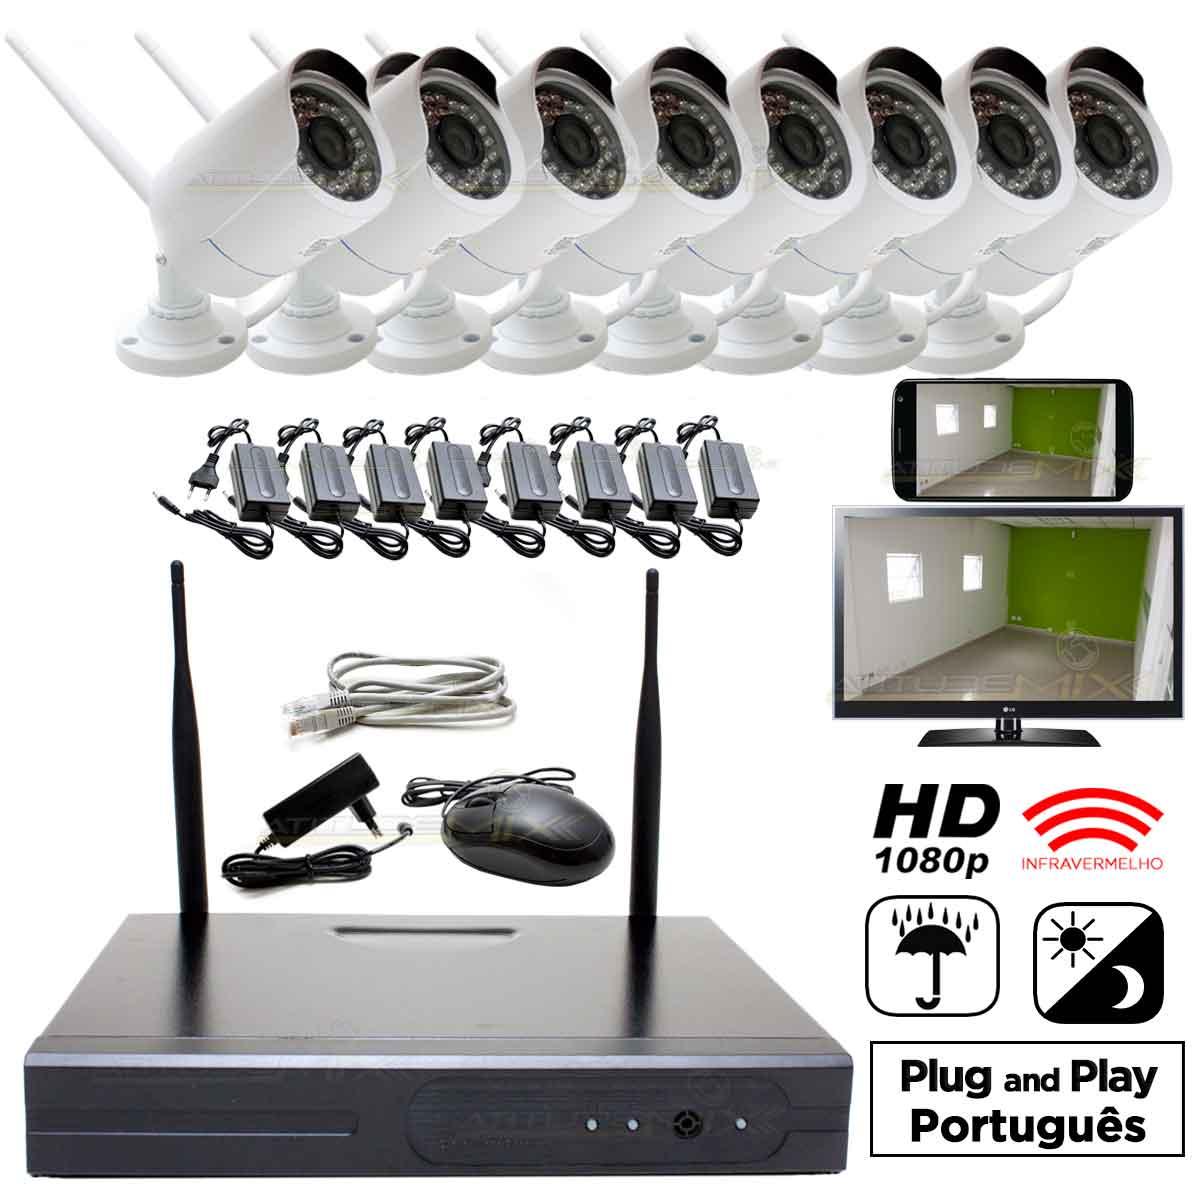 Kit Nvr 8 Câmeras 1.3mp Infra Wi-fi 100m Hd 1080p P2p Cftv